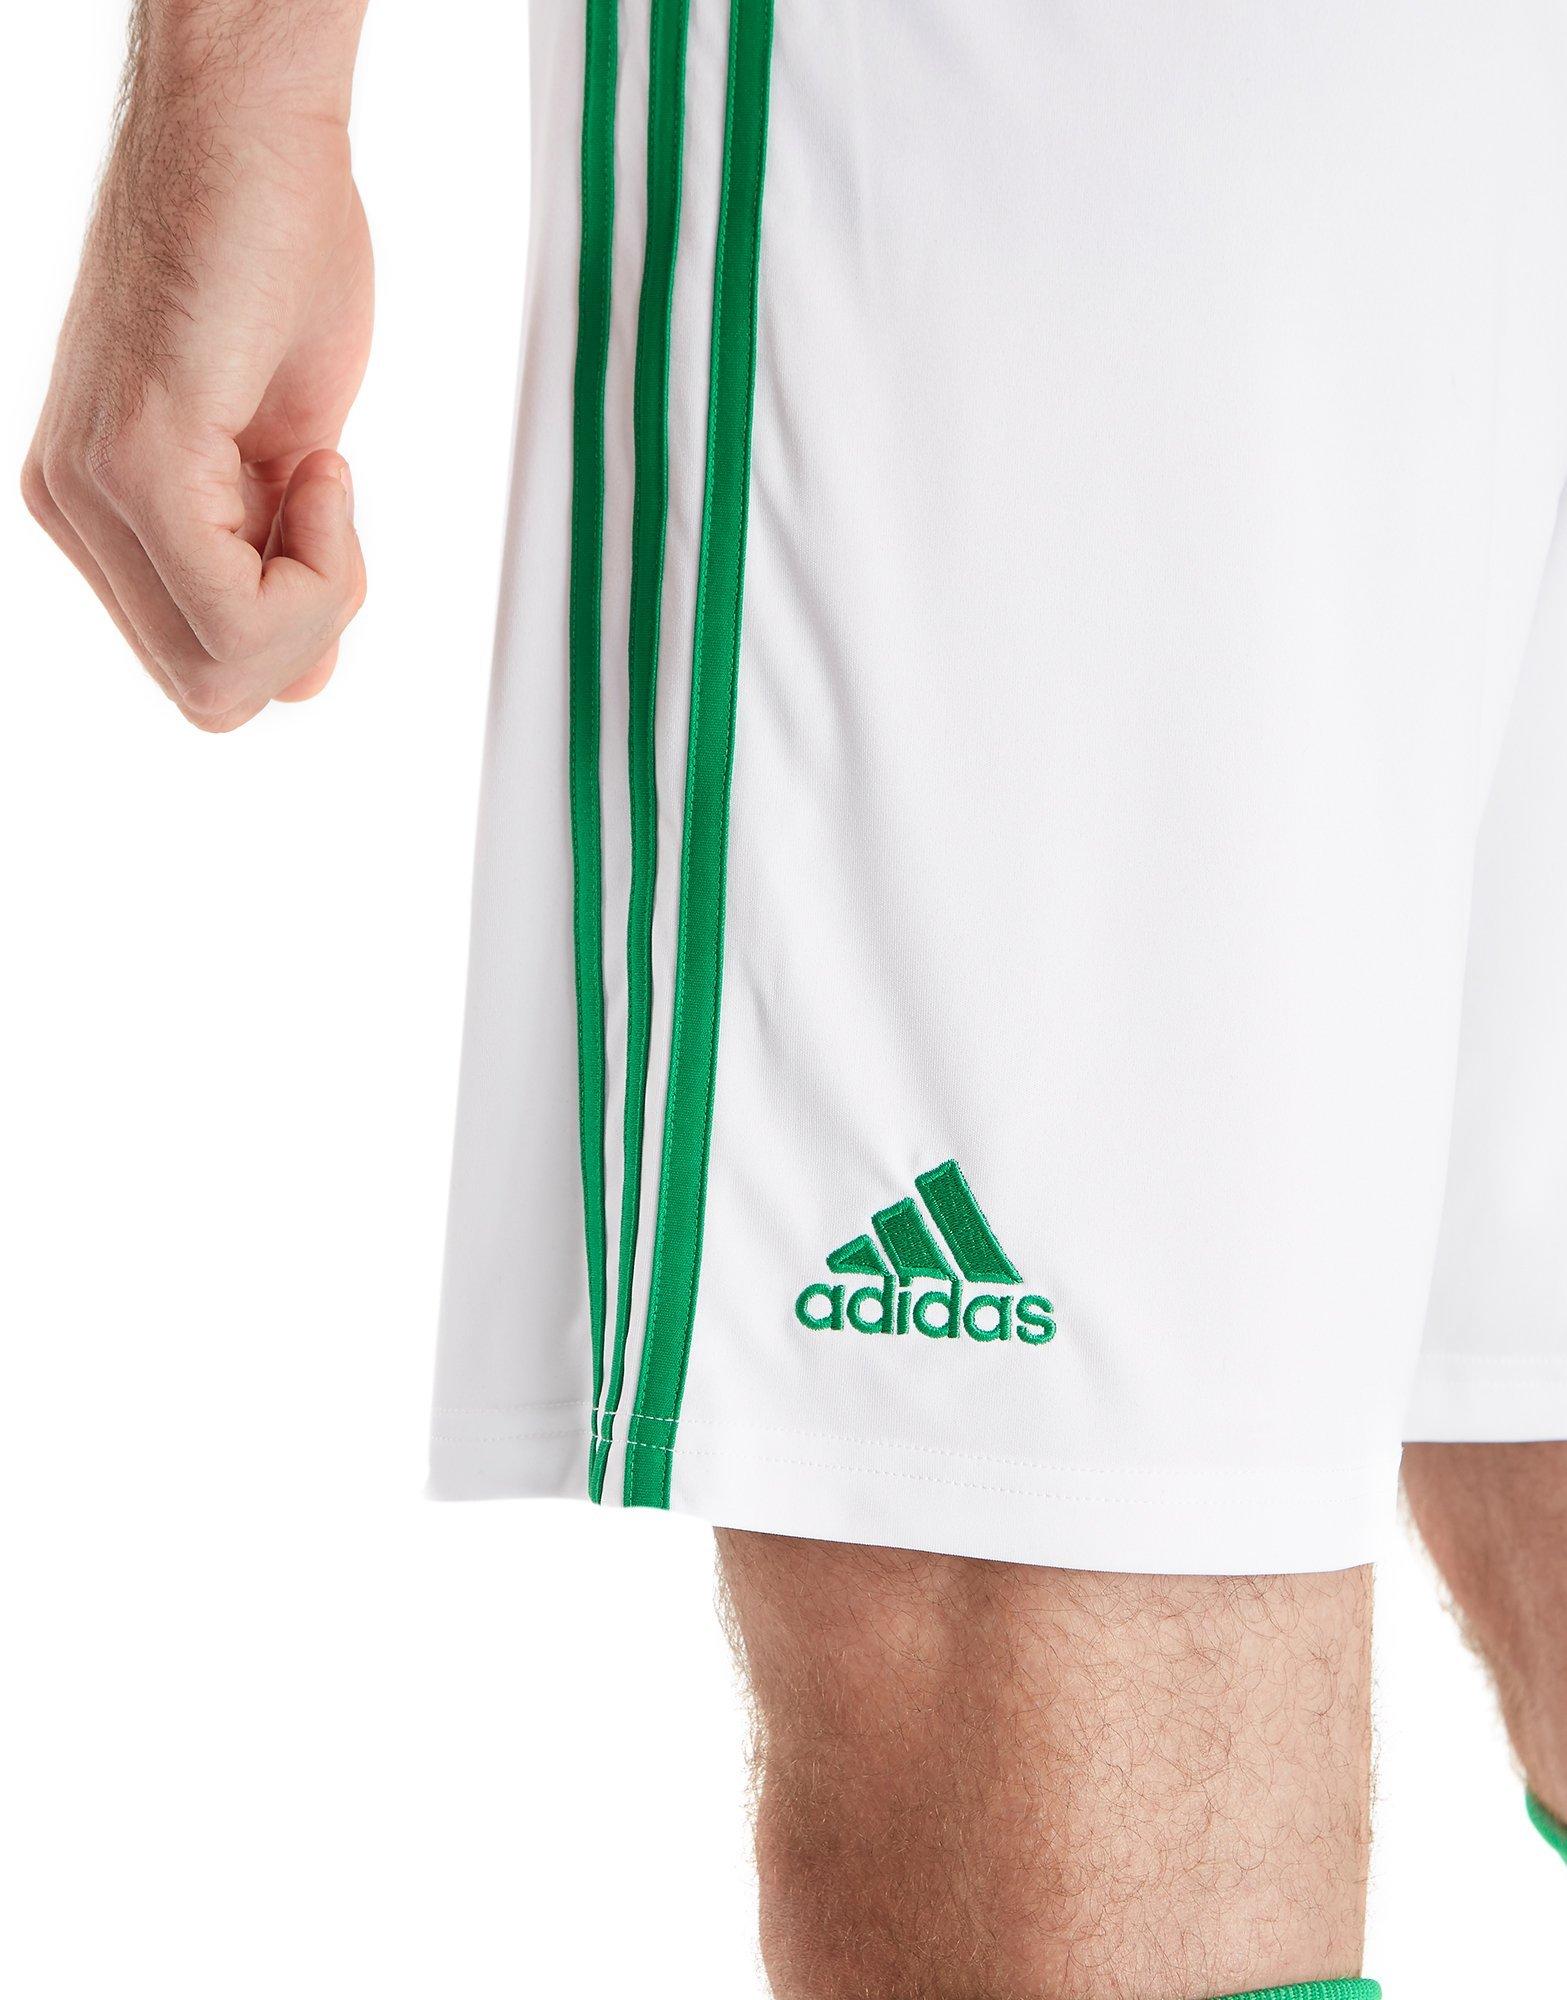 adidas Northern Ireland 2018/19 Home Shorts